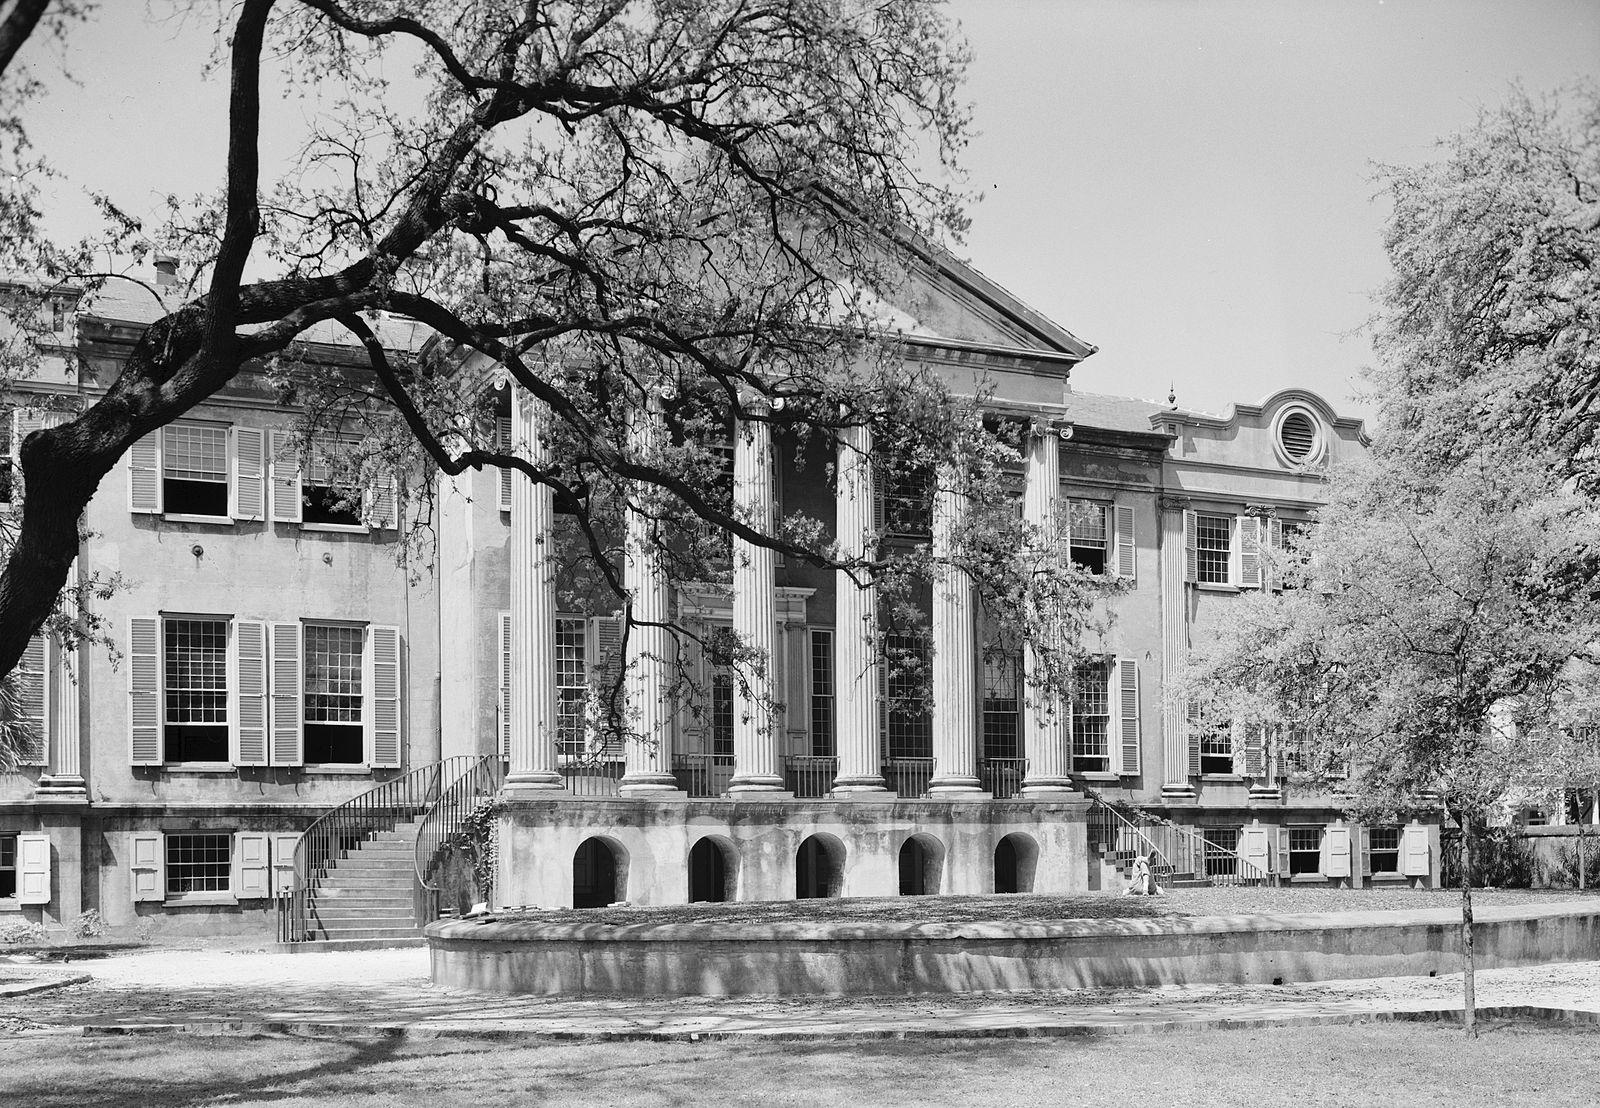 Randolph Hall, 1940, courtesy of The Library of Congress